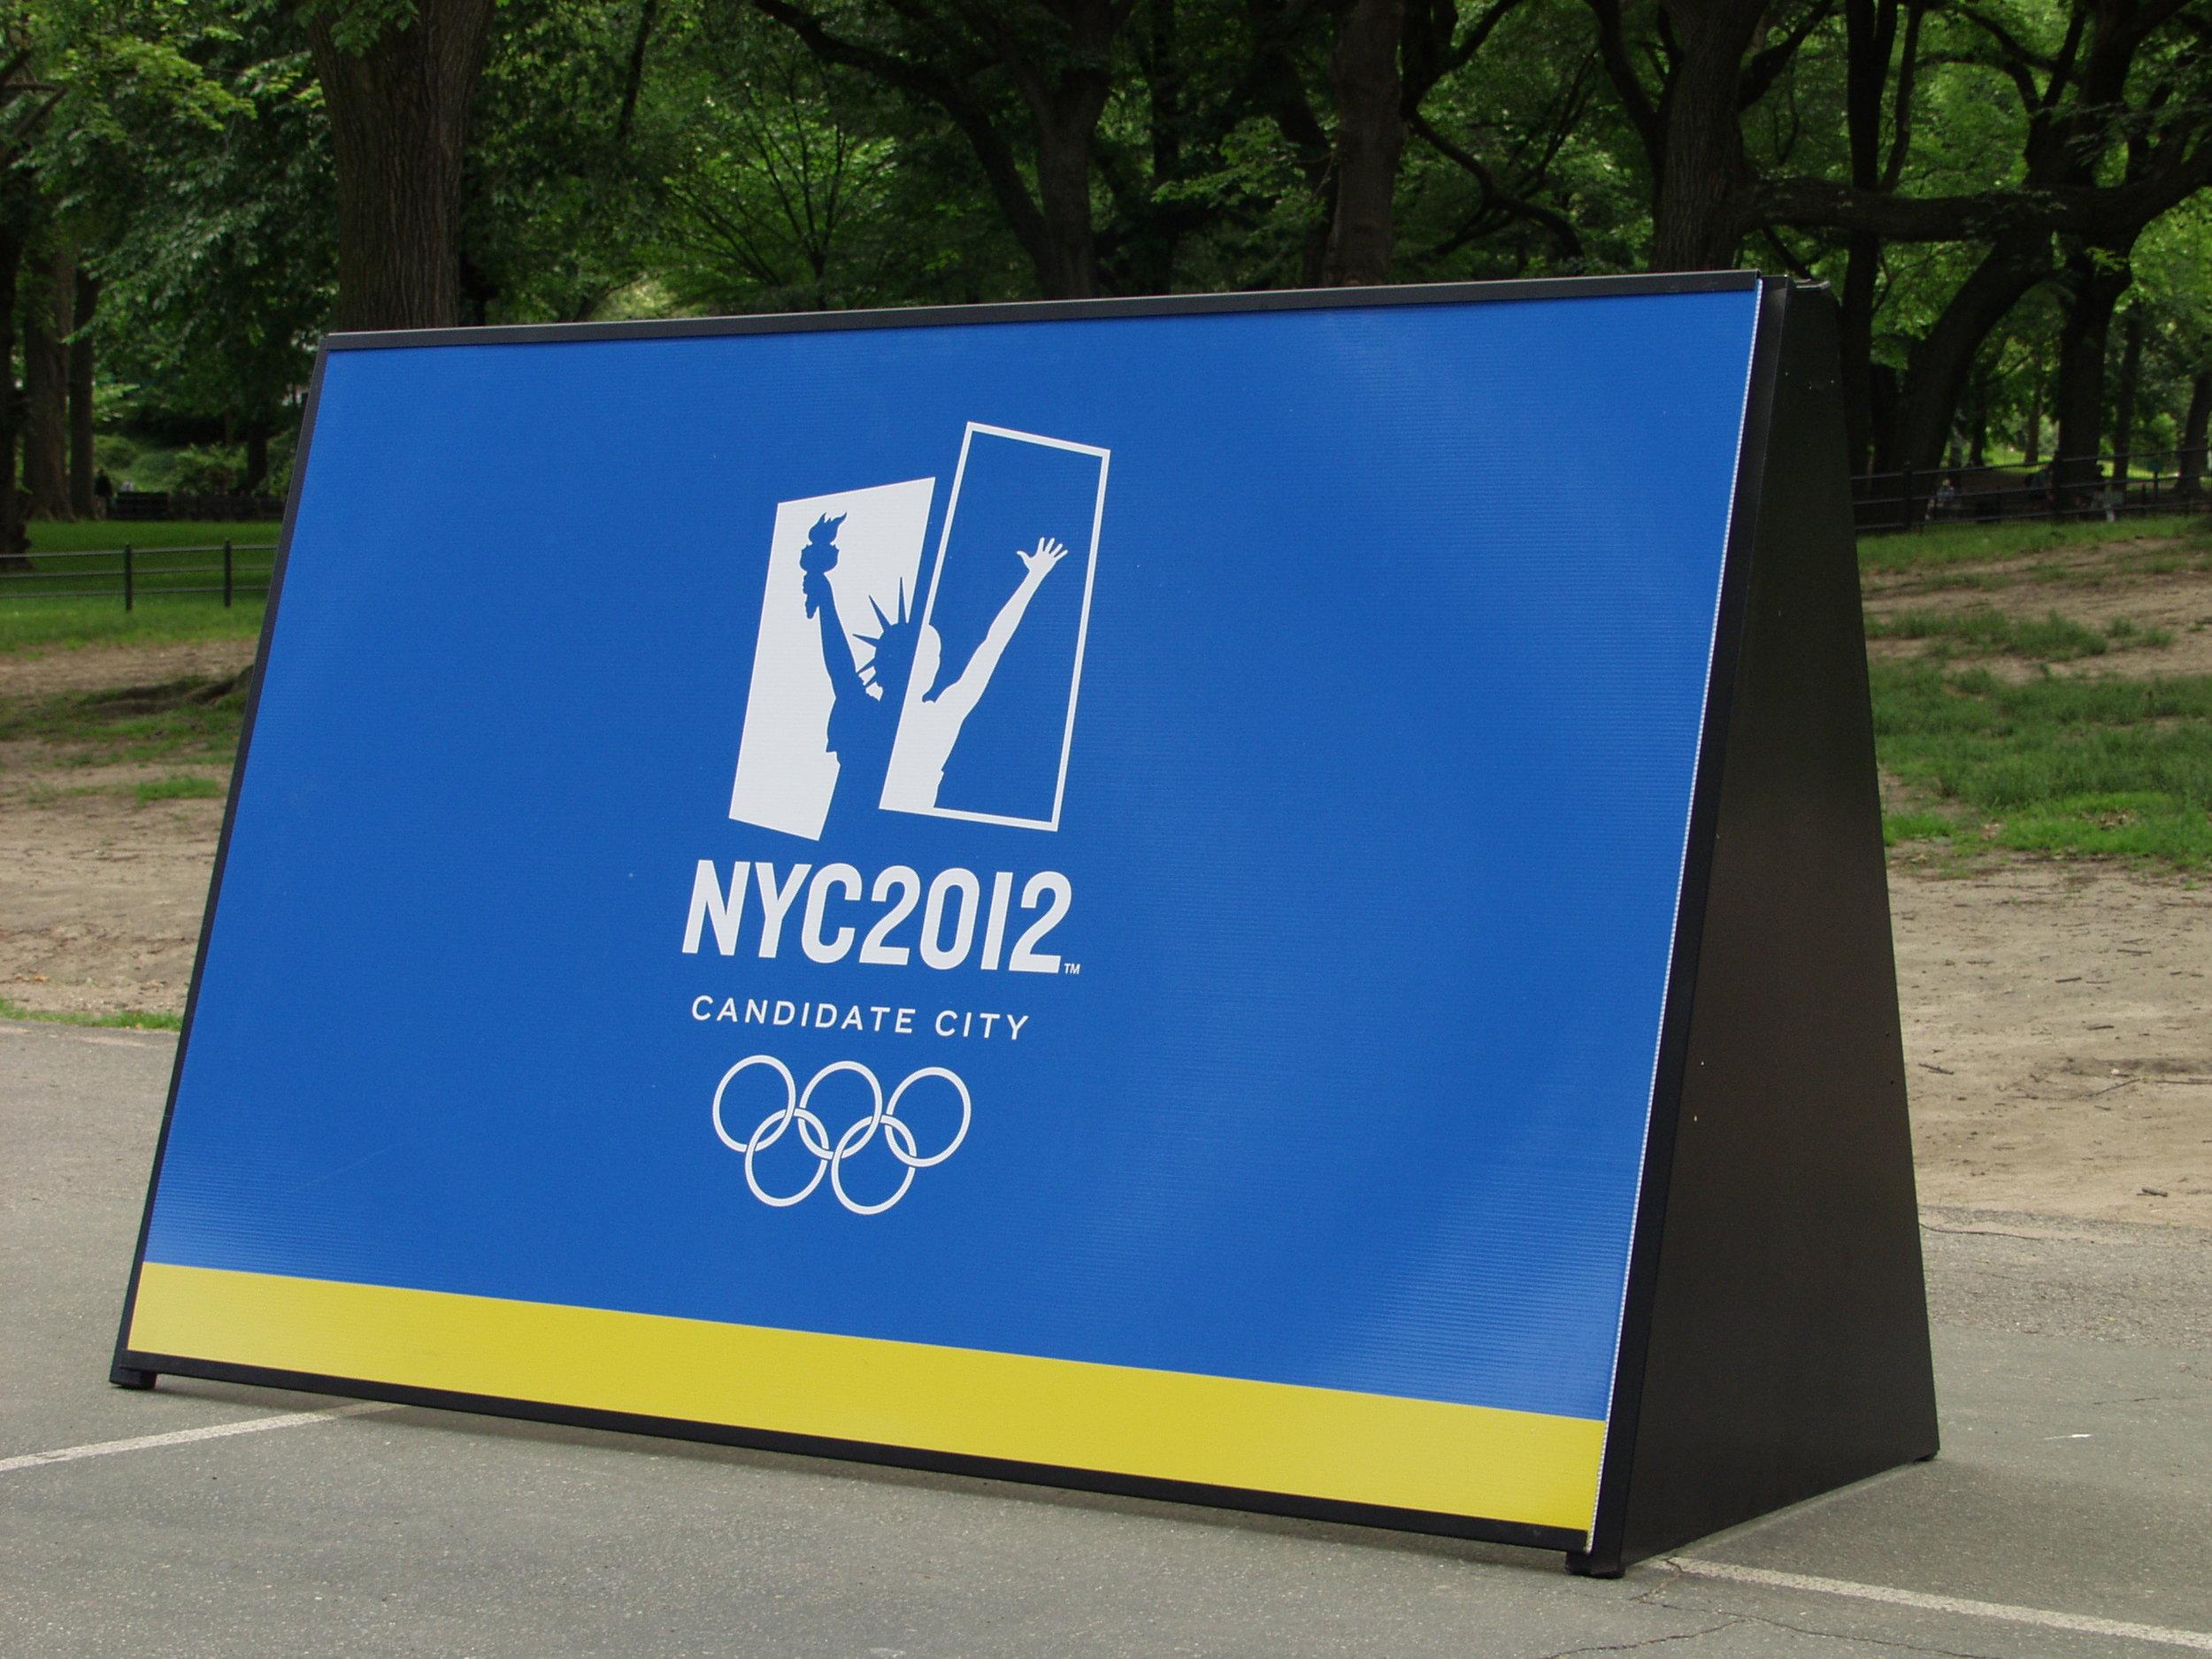 APCG_NYCOlympicBid3.JPG